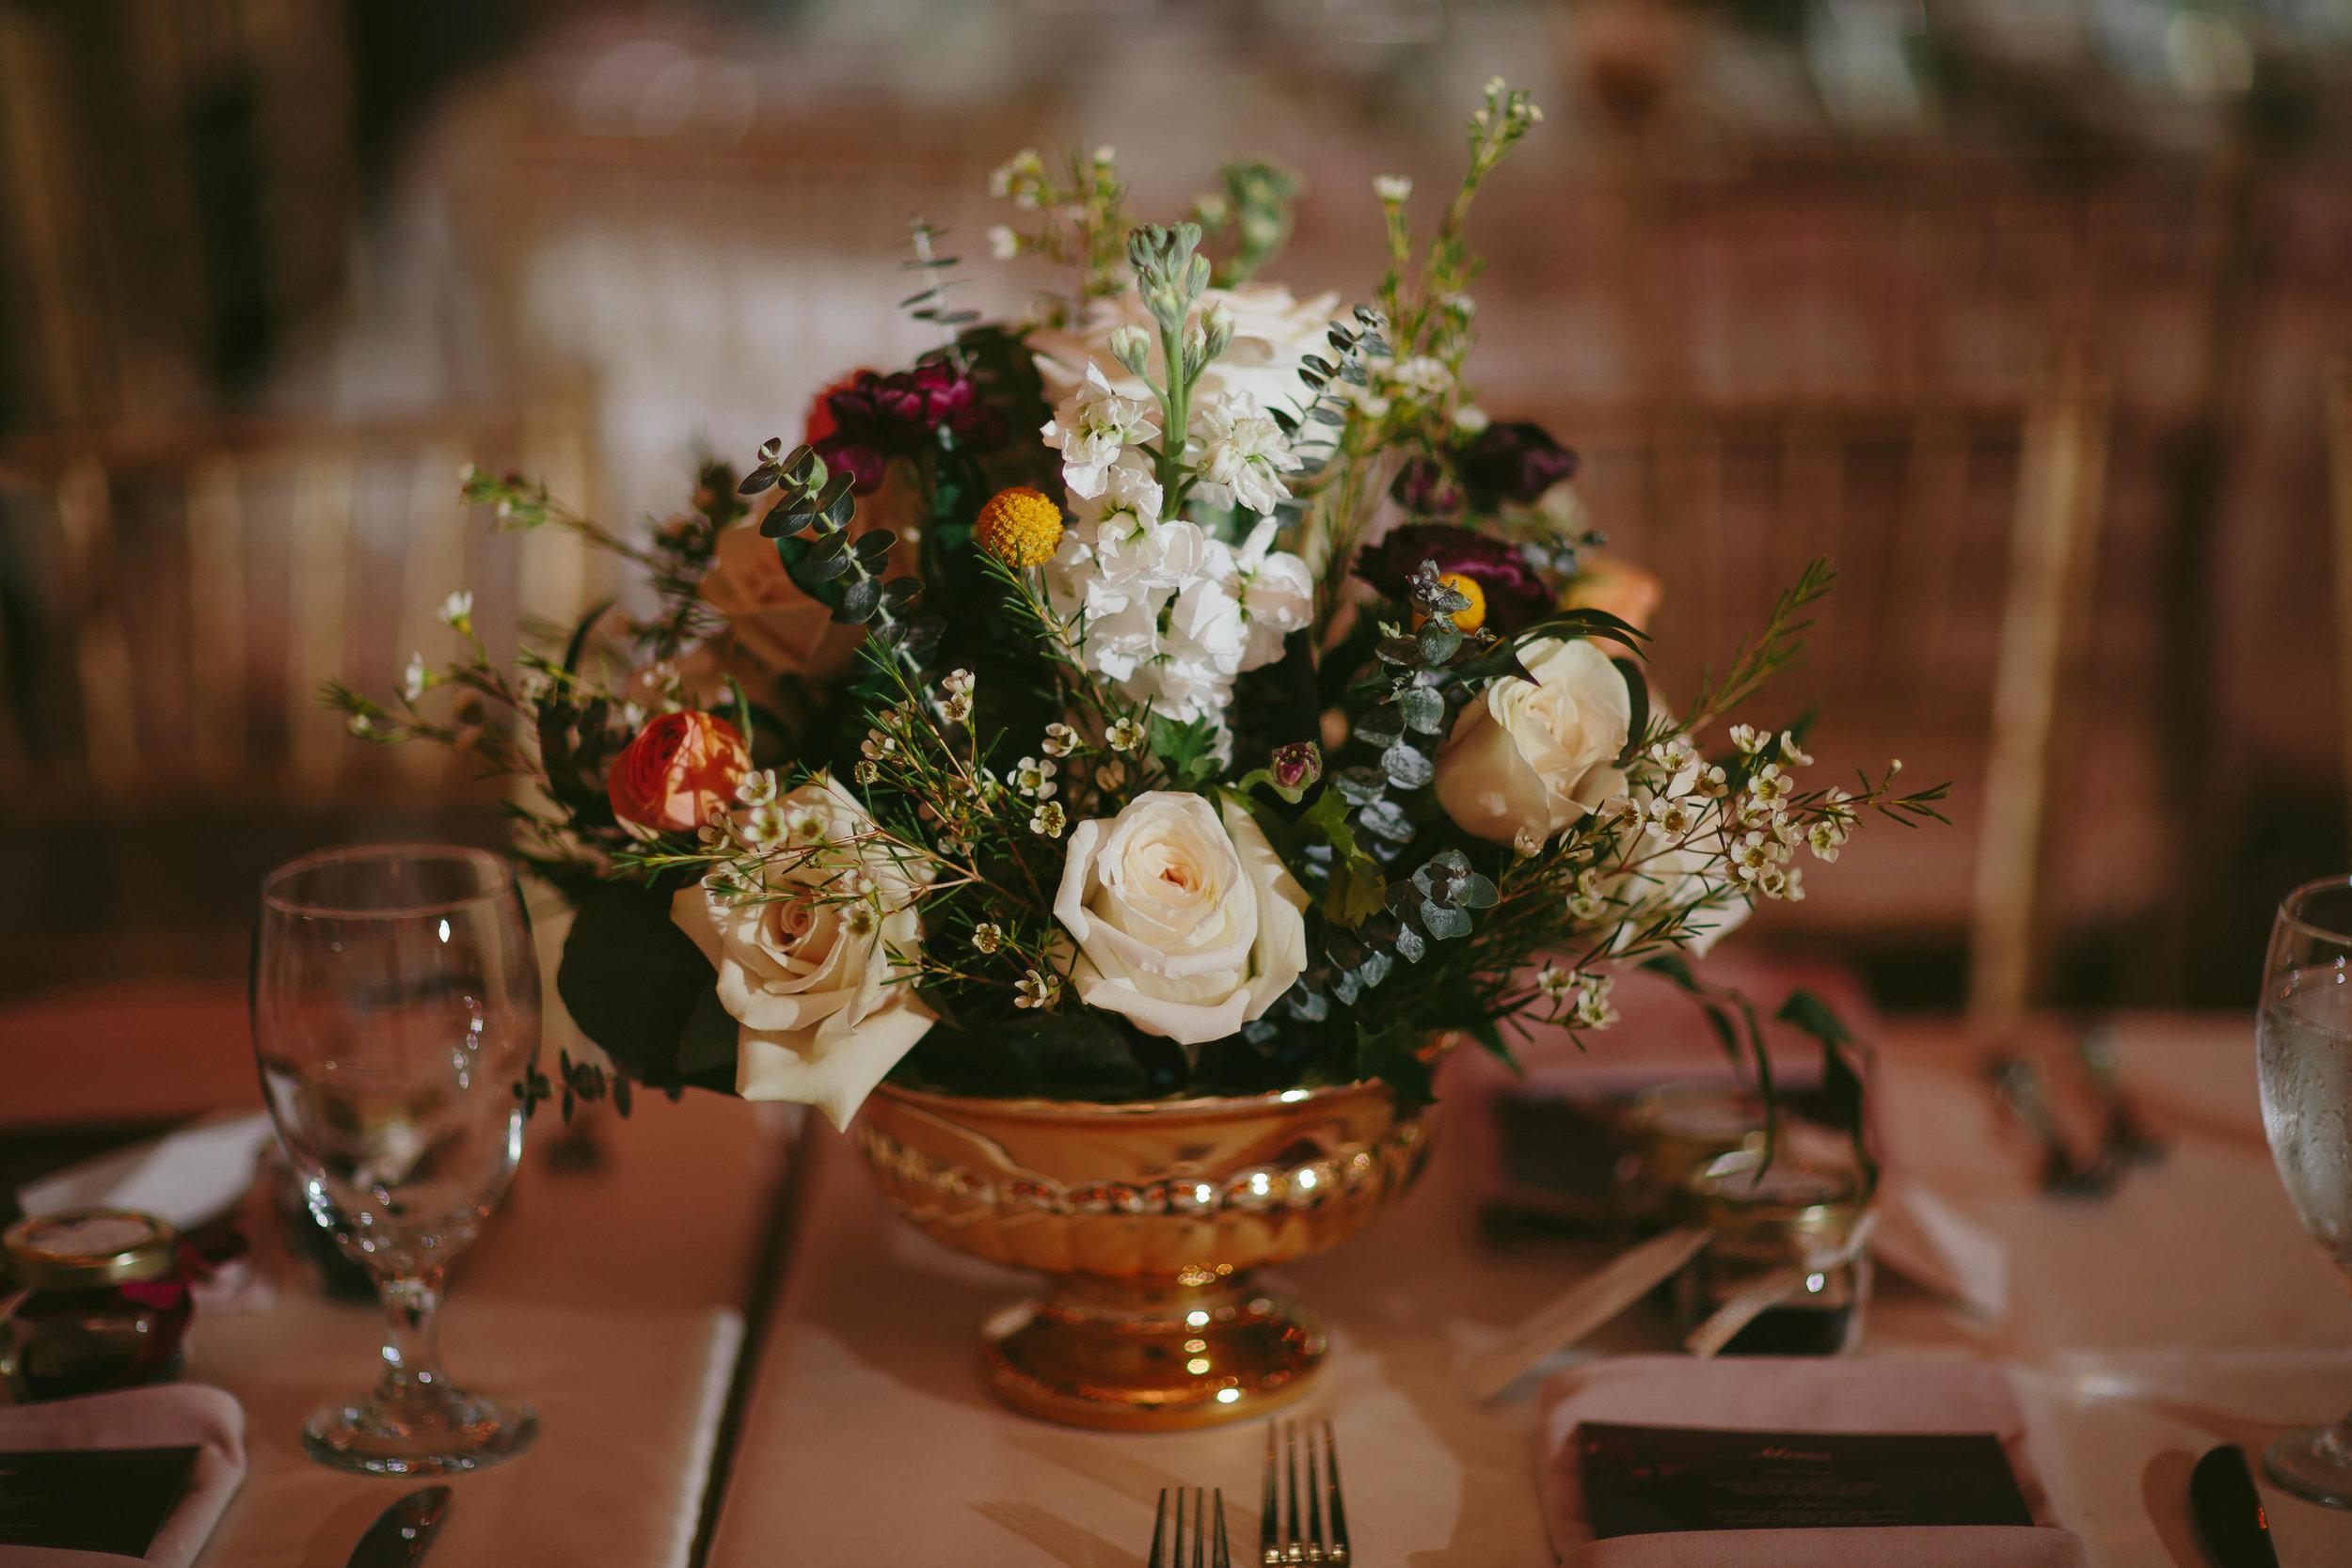 floral-arrangements-tables-flamingo-gardens-wedding-details-tiny-house-photo-florida-wedding-photographer.jpg